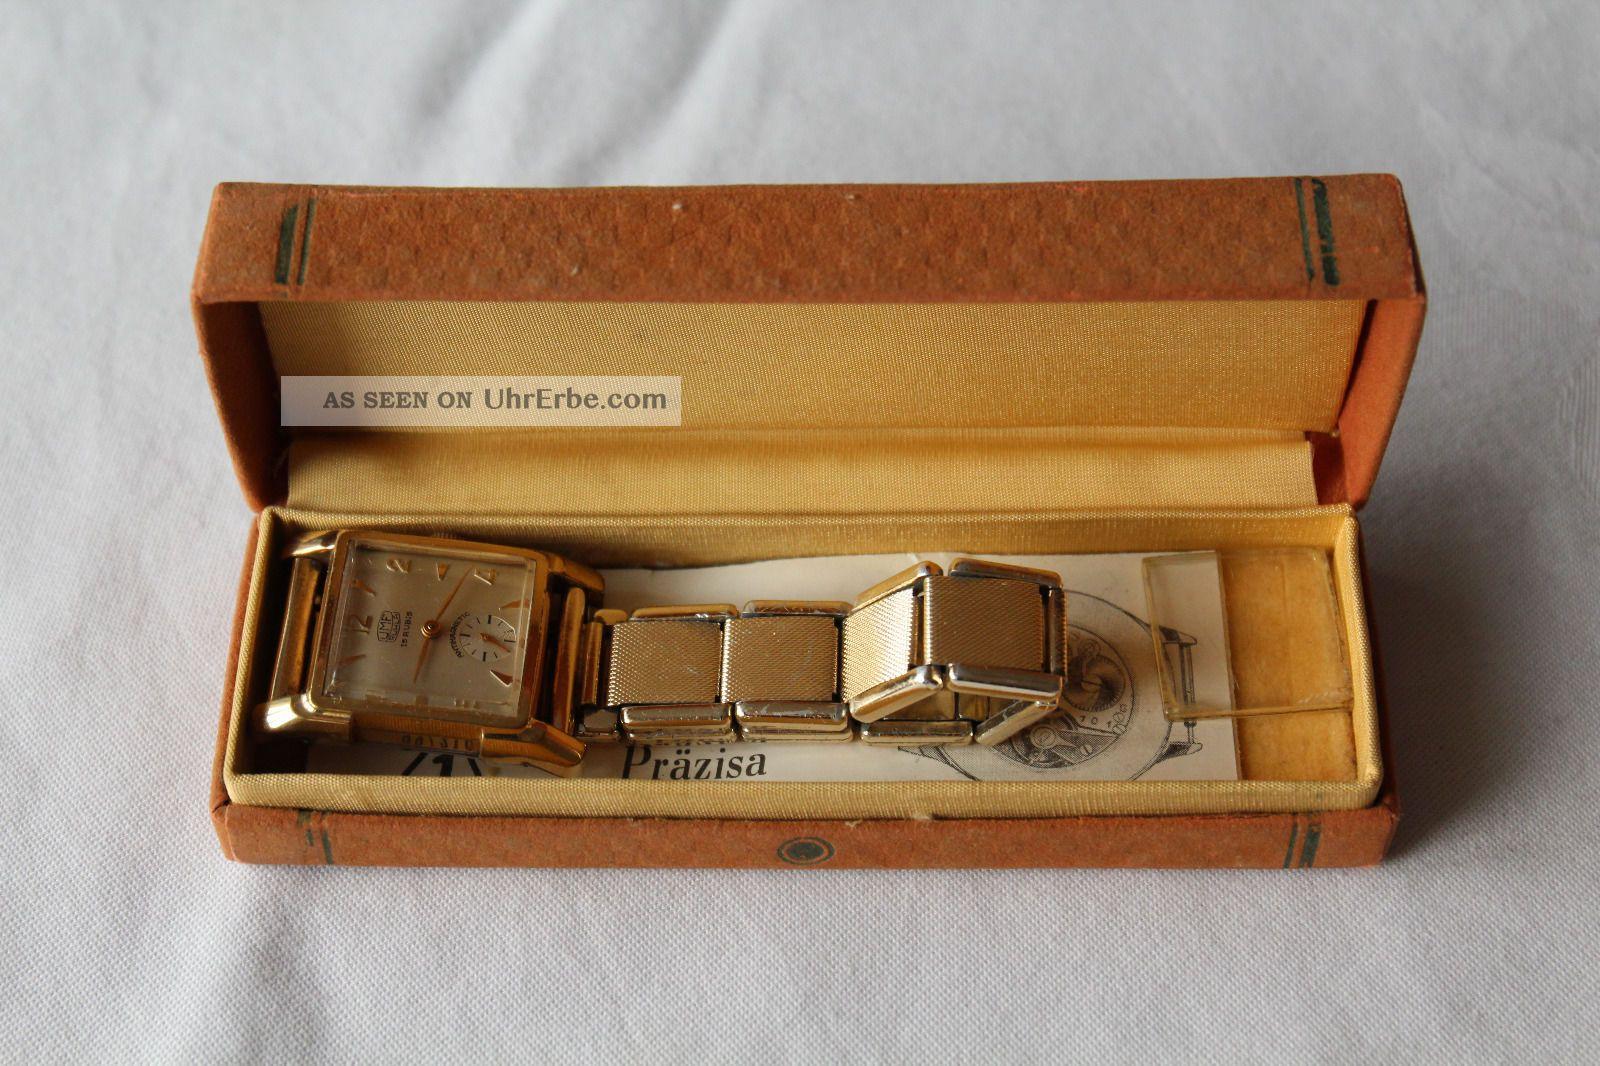 Umf Ruhla 15 Rubis Herrenuhr Armbanduhr Handaufzug Mechanisch Armbanduhren Bild